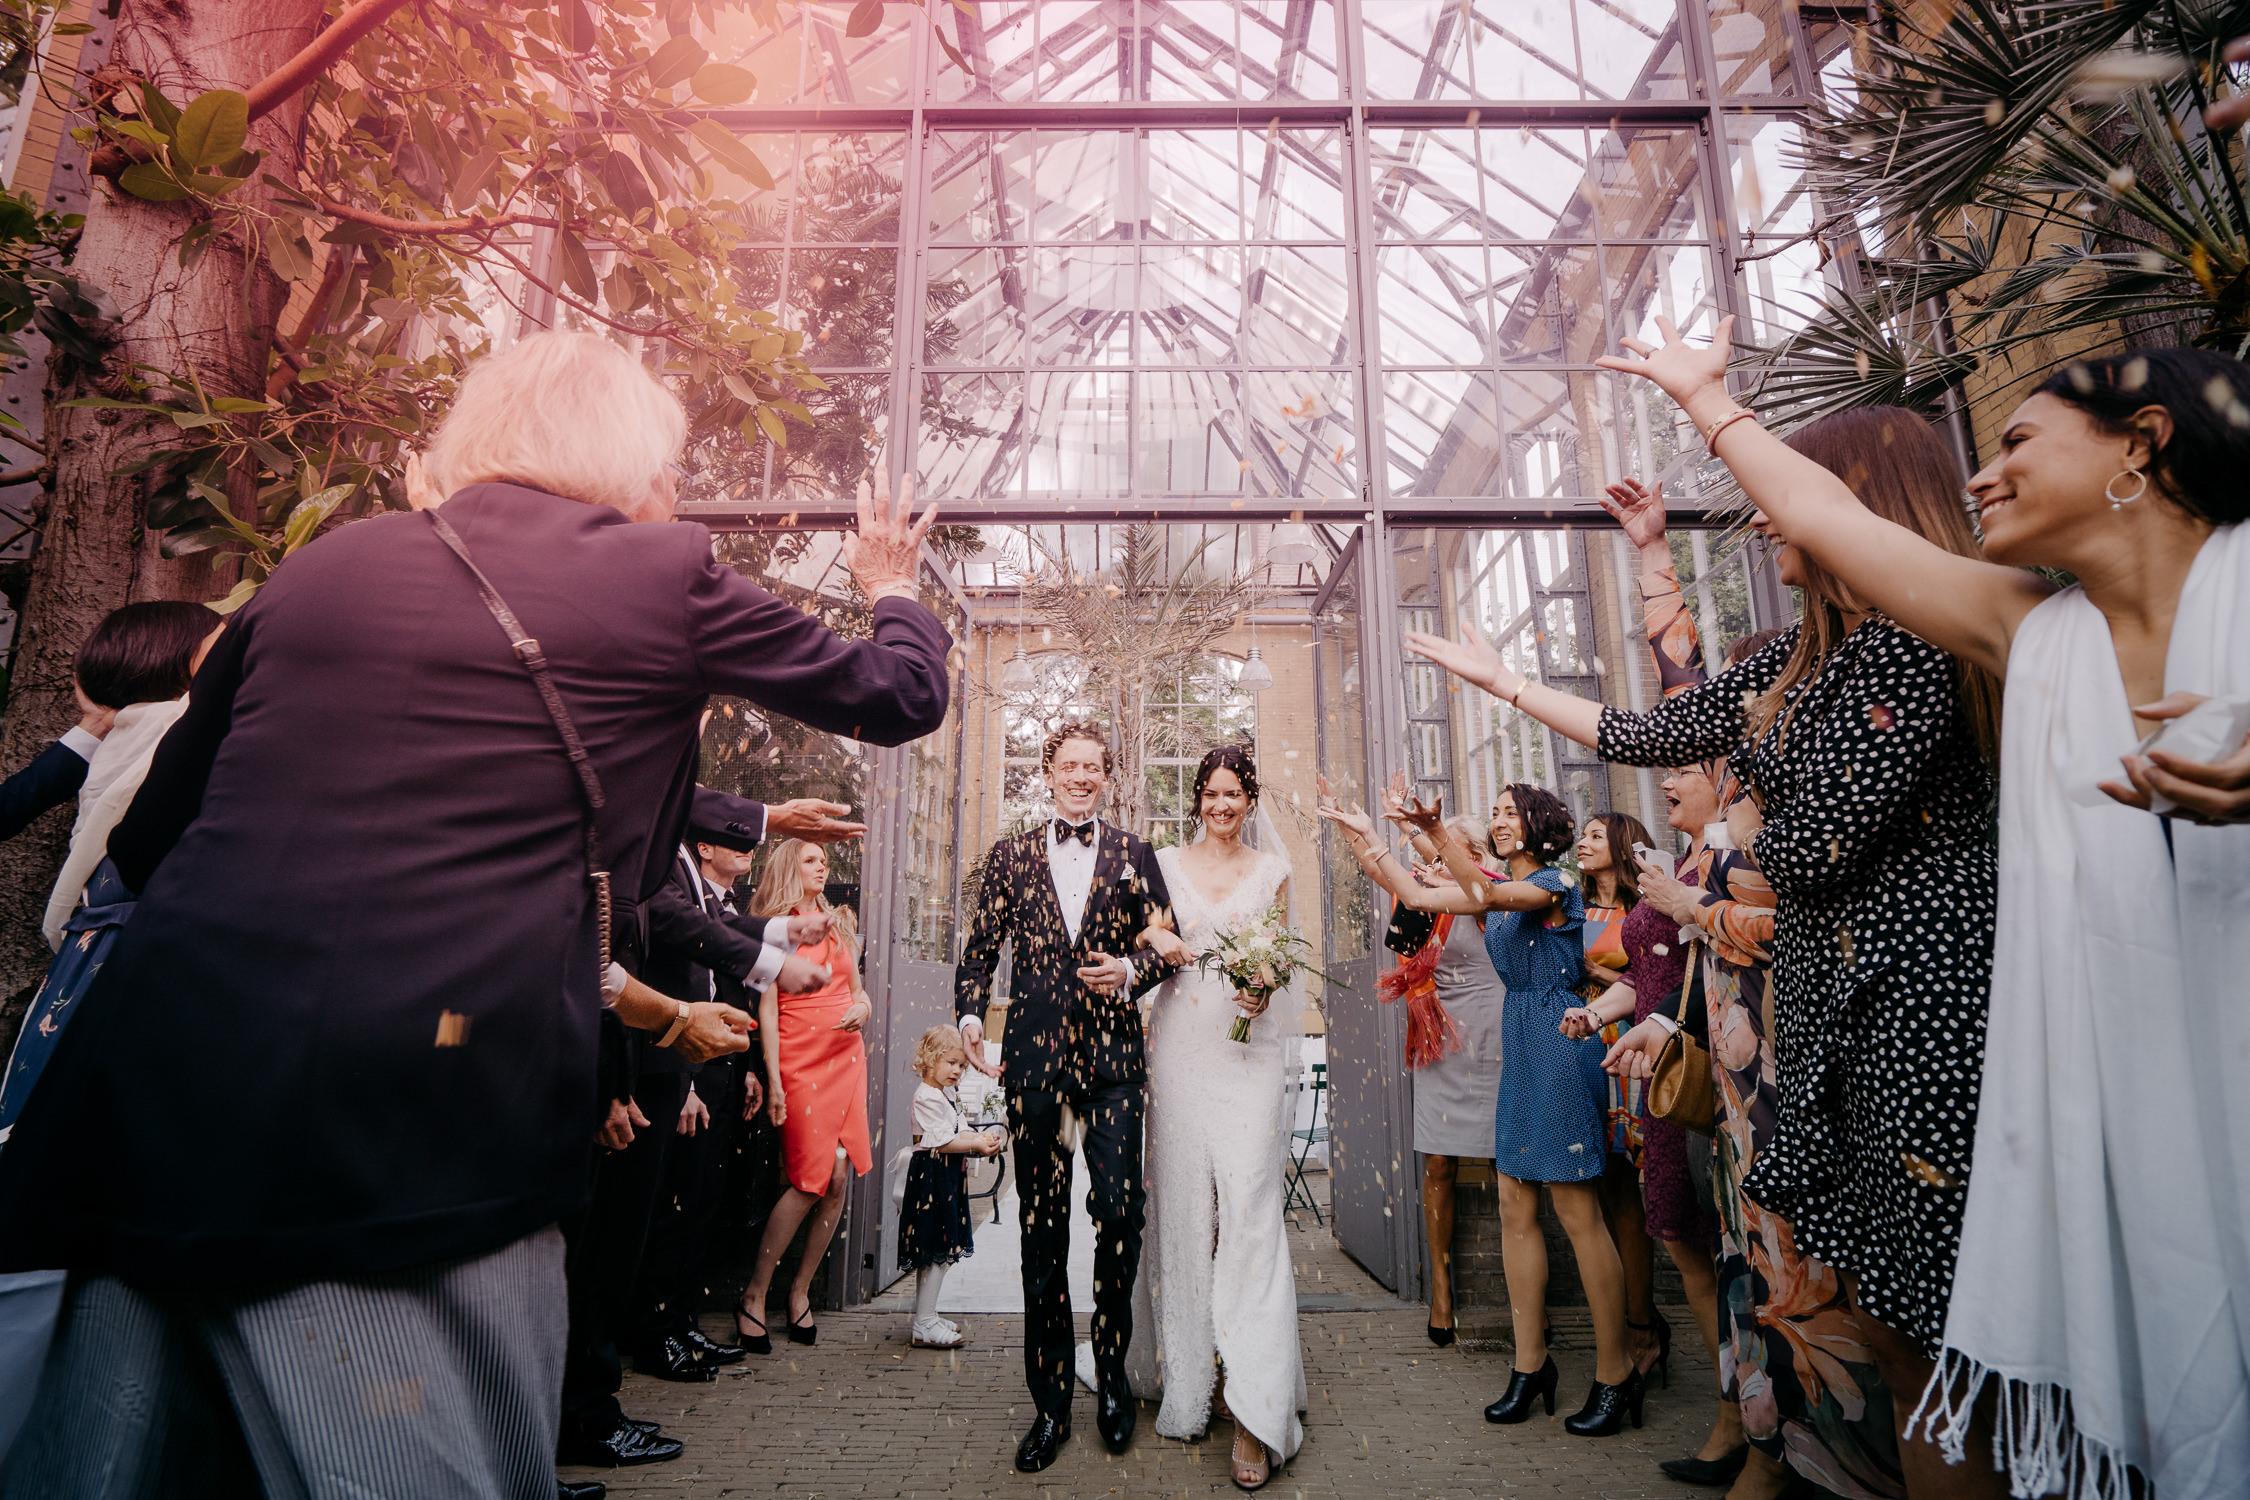 bruidsfotografie-trouwfotograaf-amsterdam-utrecht-mark-hadden-Lex and Sophie-160-3.jpg